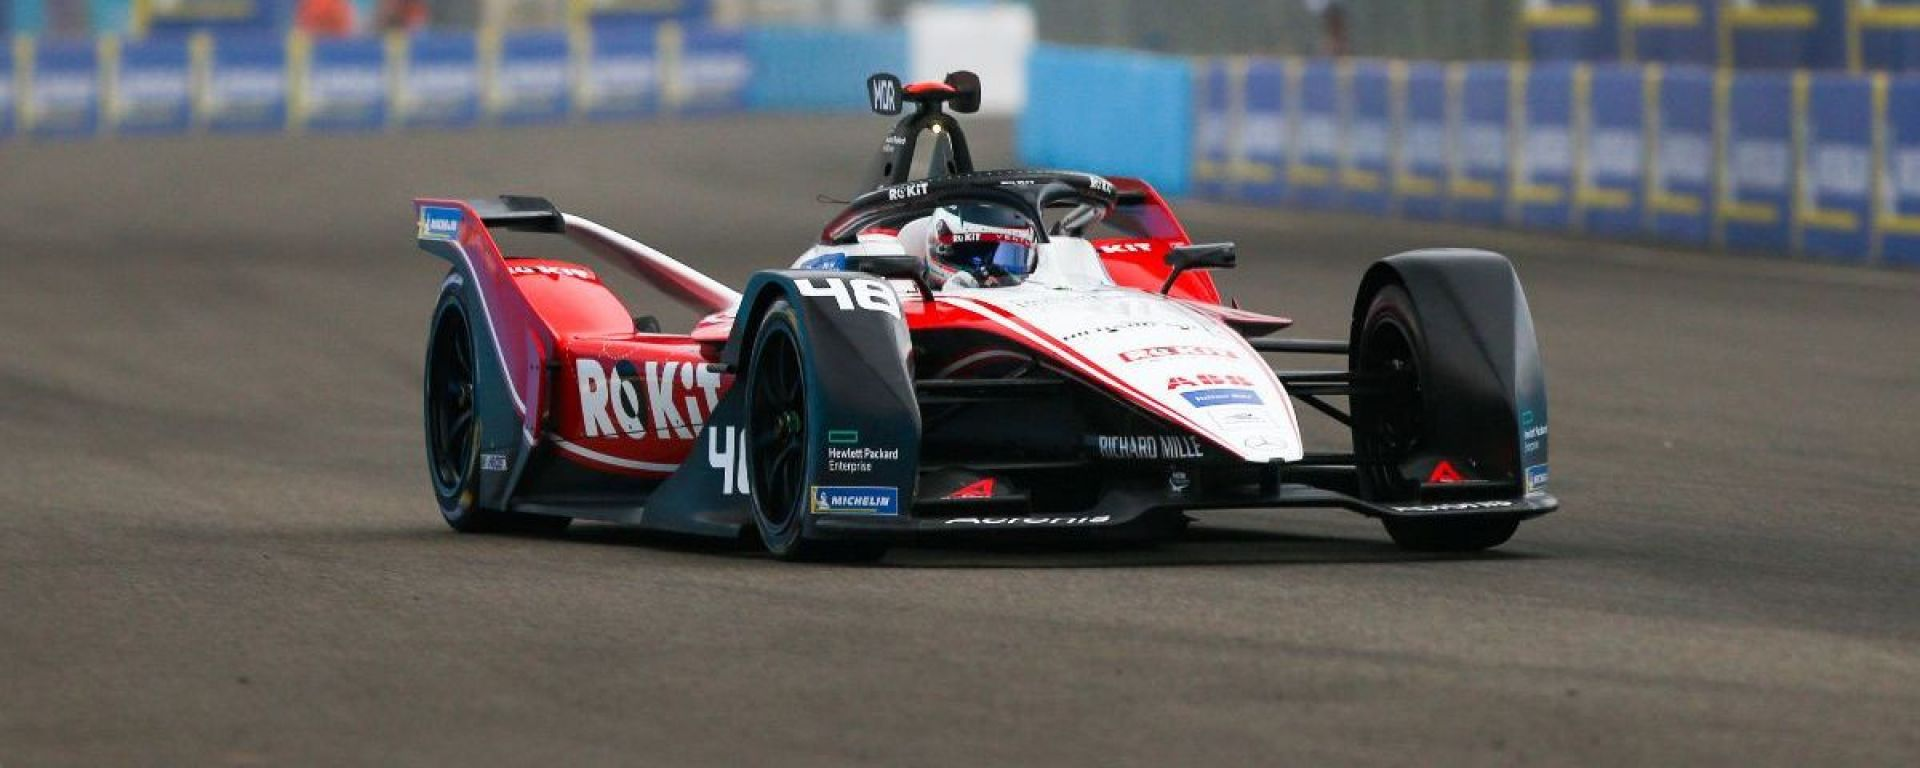 Formula E, ePrix Berlino 2020: Edoardo Mortara (Venturi Racing) in pista